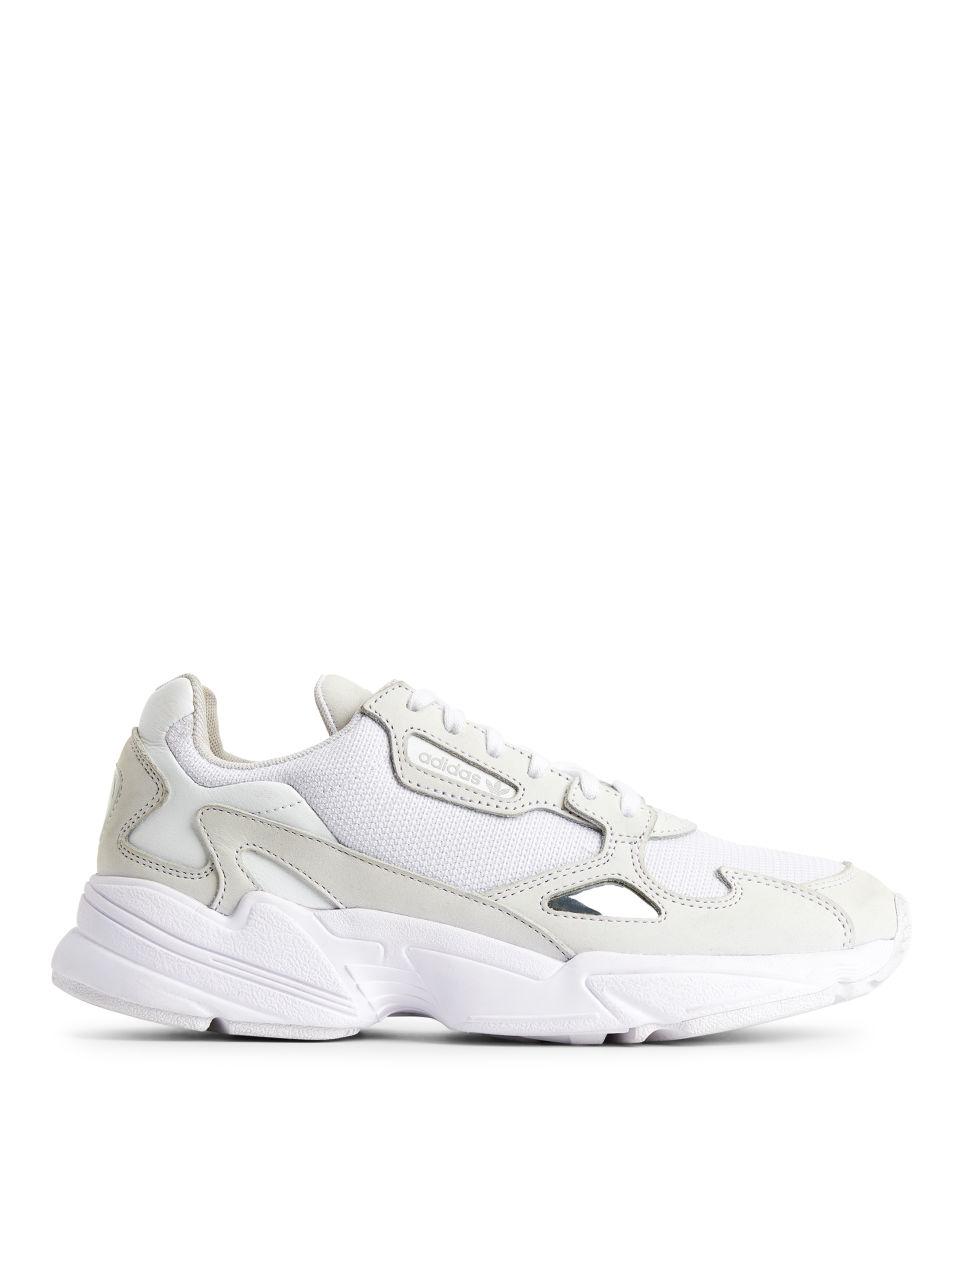 adidas Falcon Trainers - White